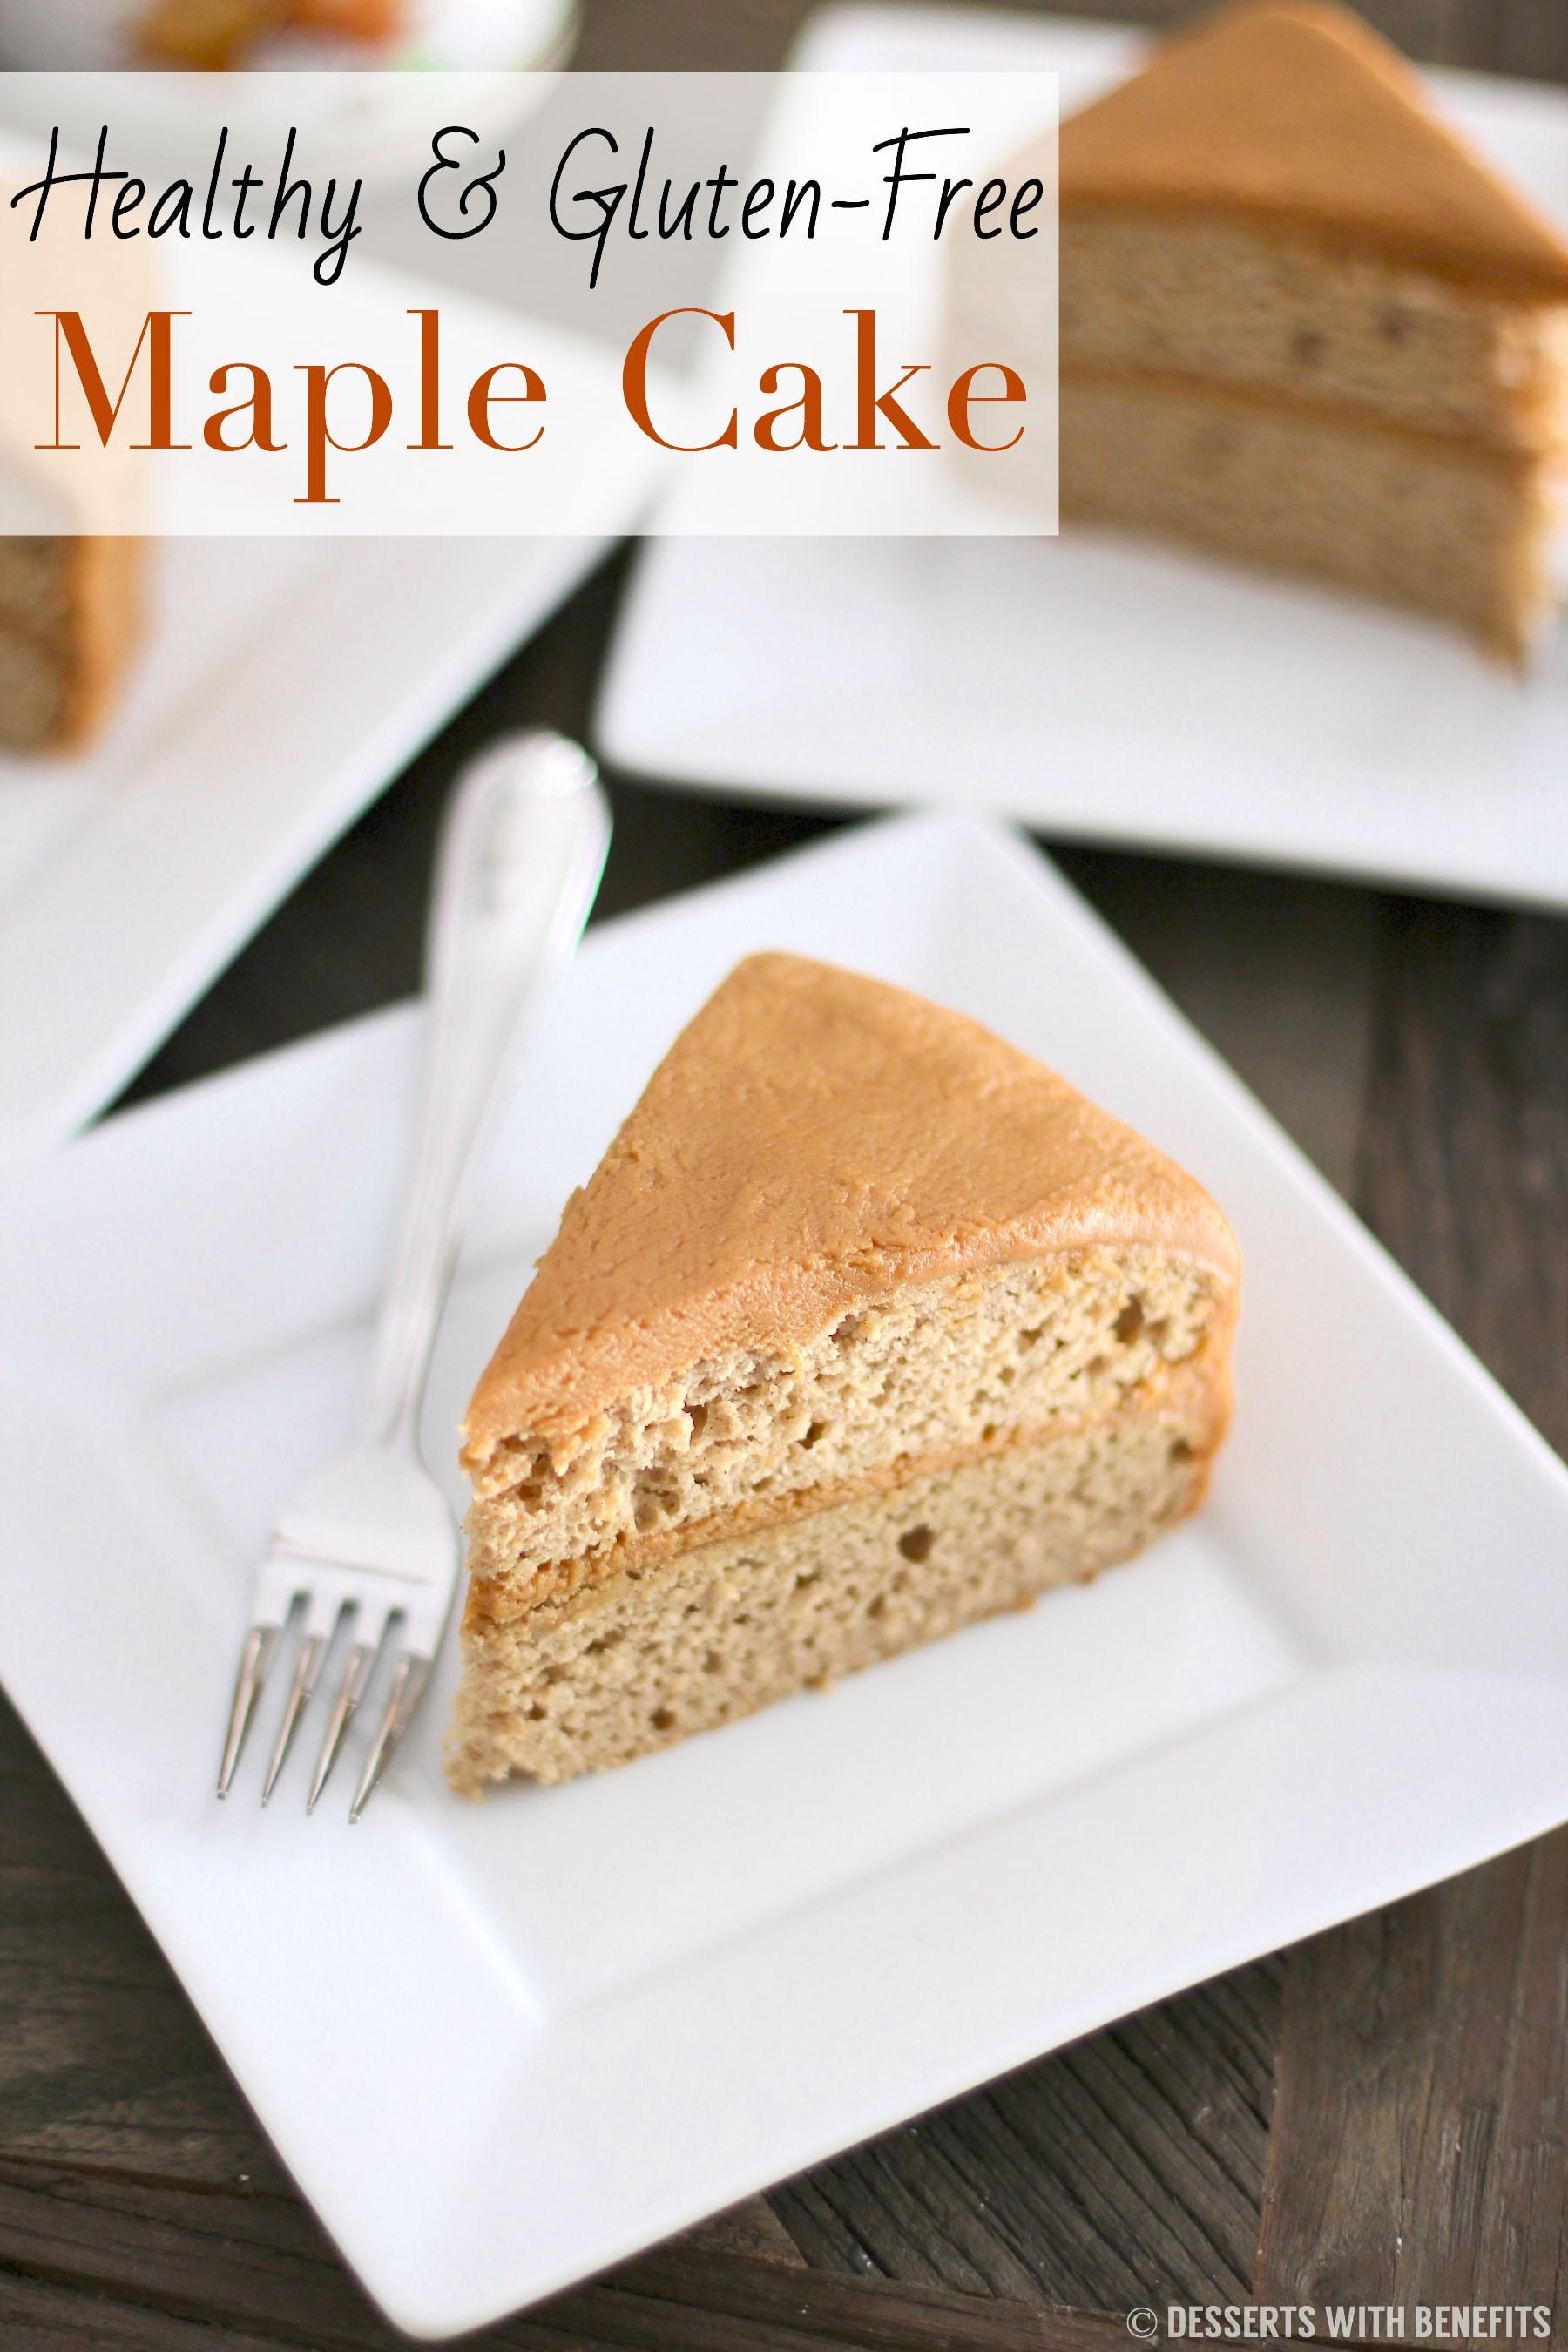 Gluten Free Dairy Free Sugar Free Dessert Recipes  Healthy Gluten Free Maple Cake Recipe